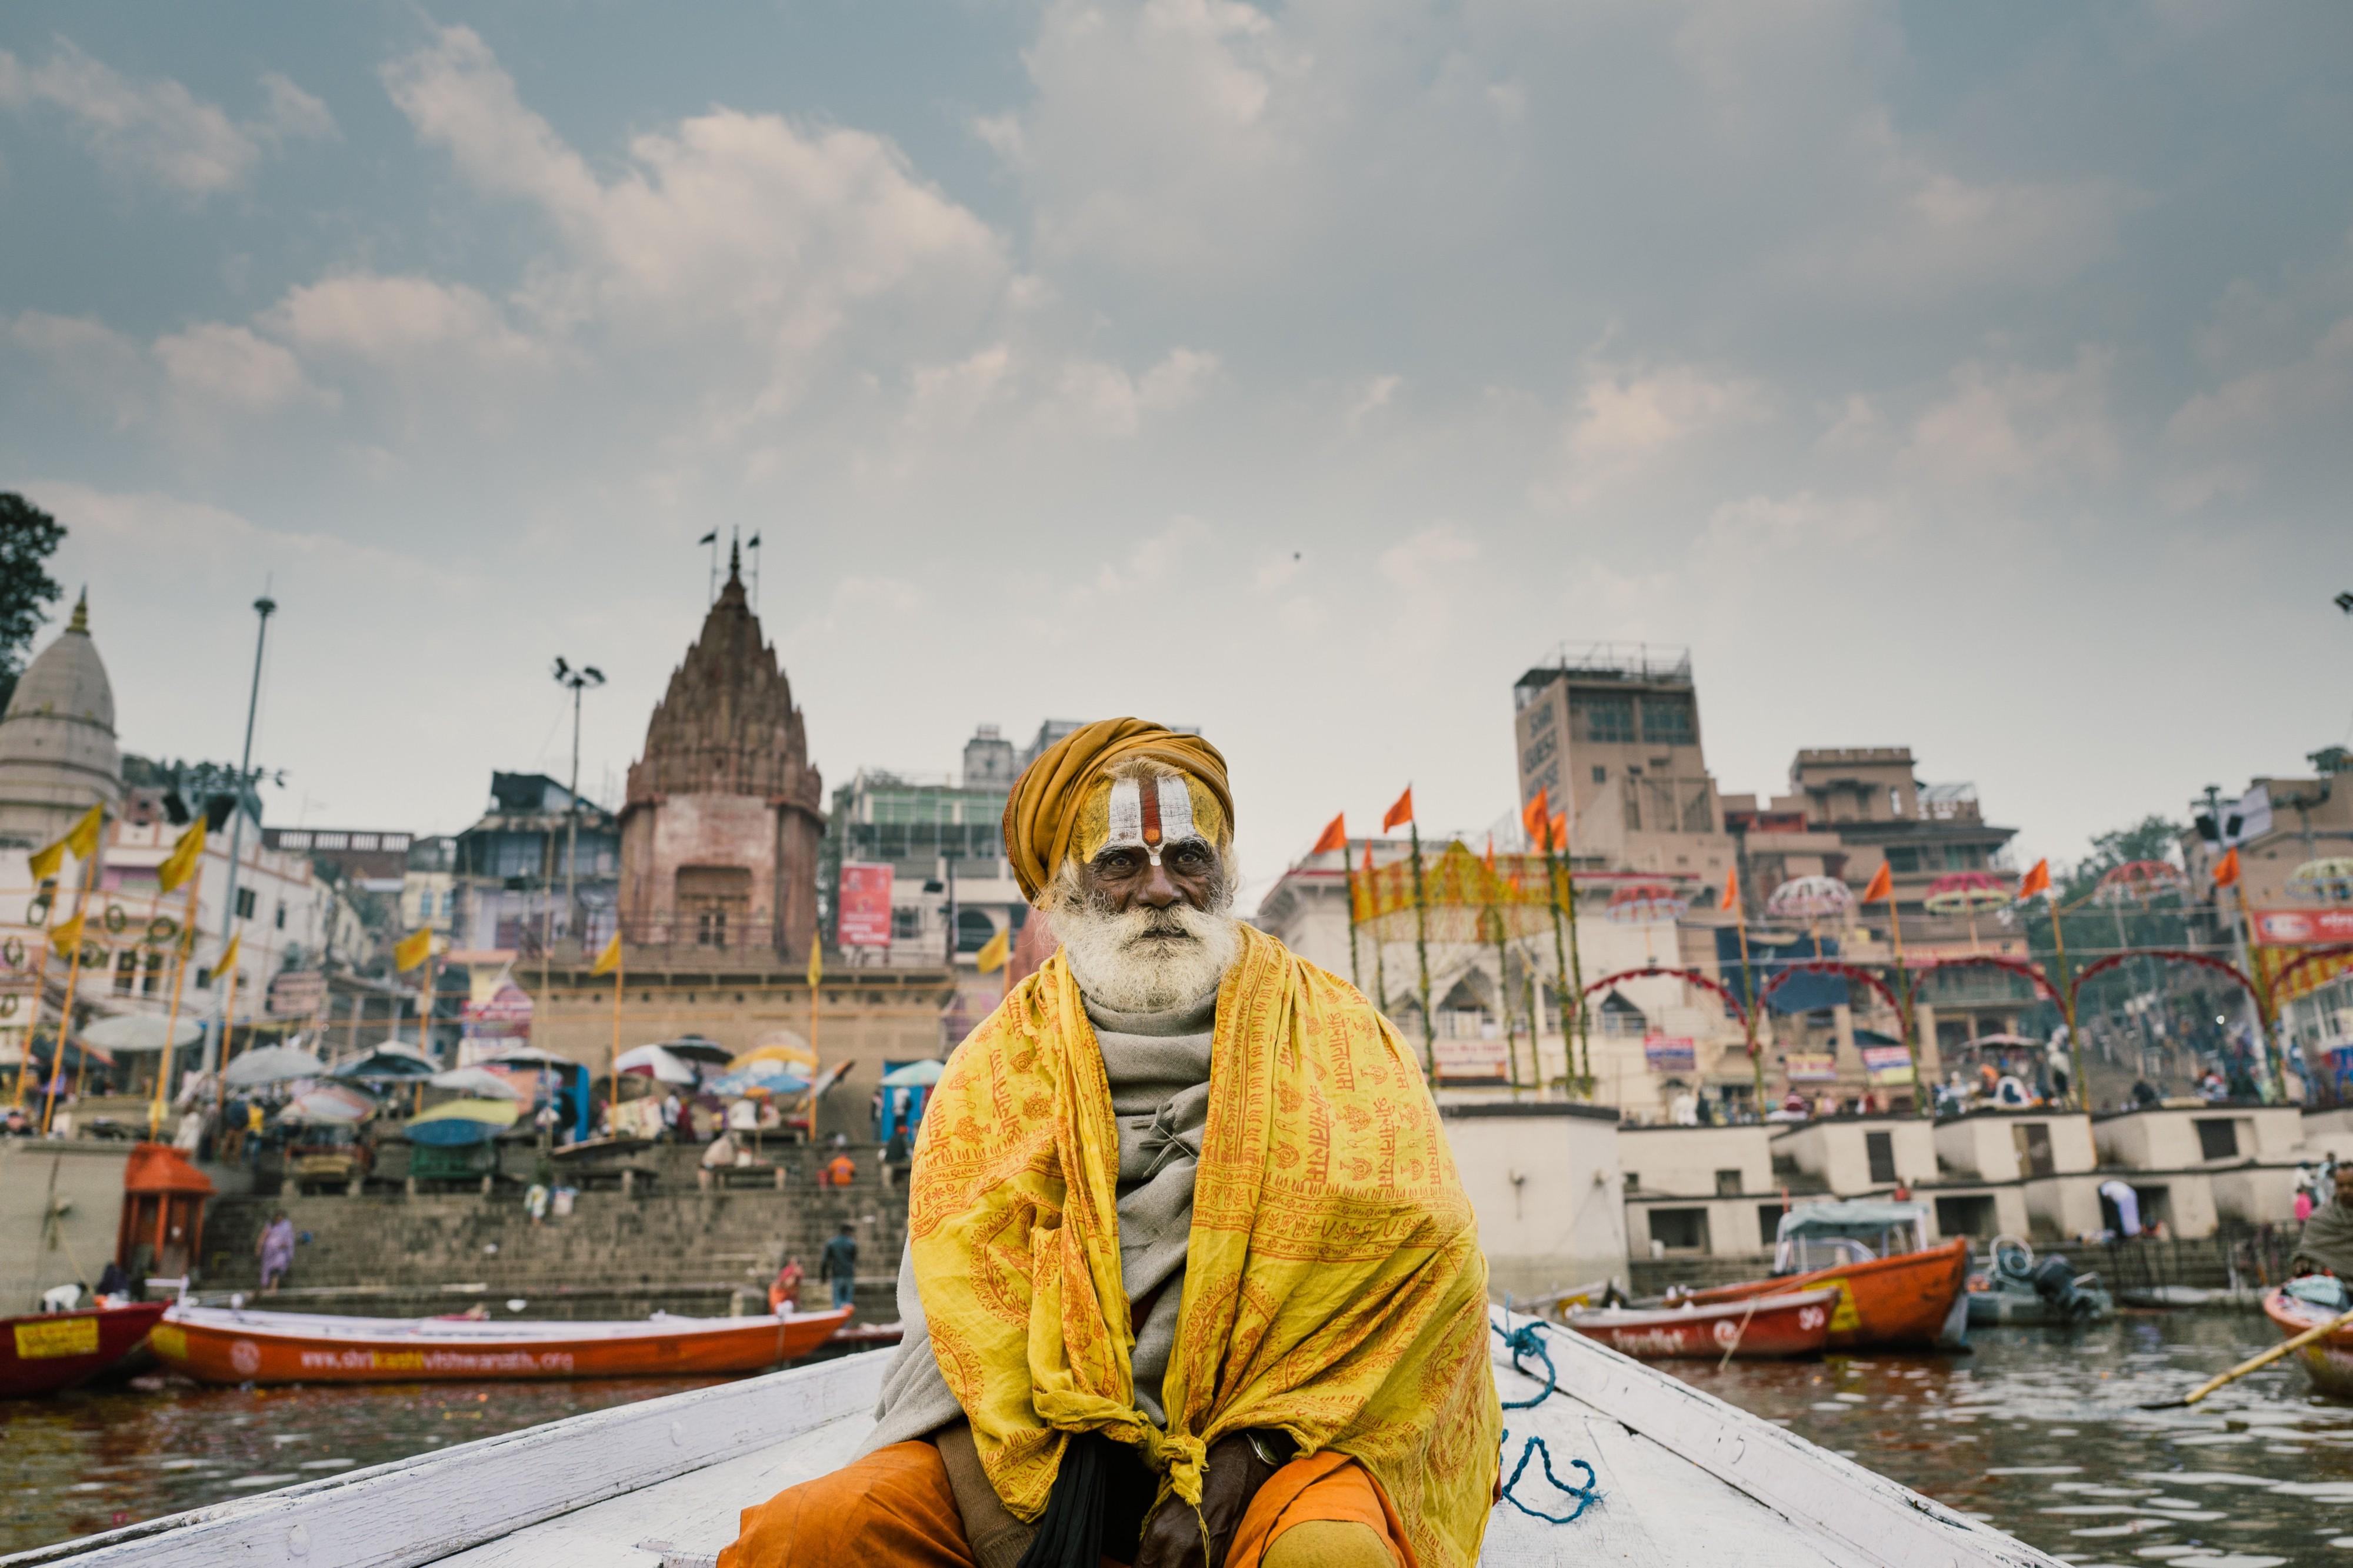 Sadhu on a boat